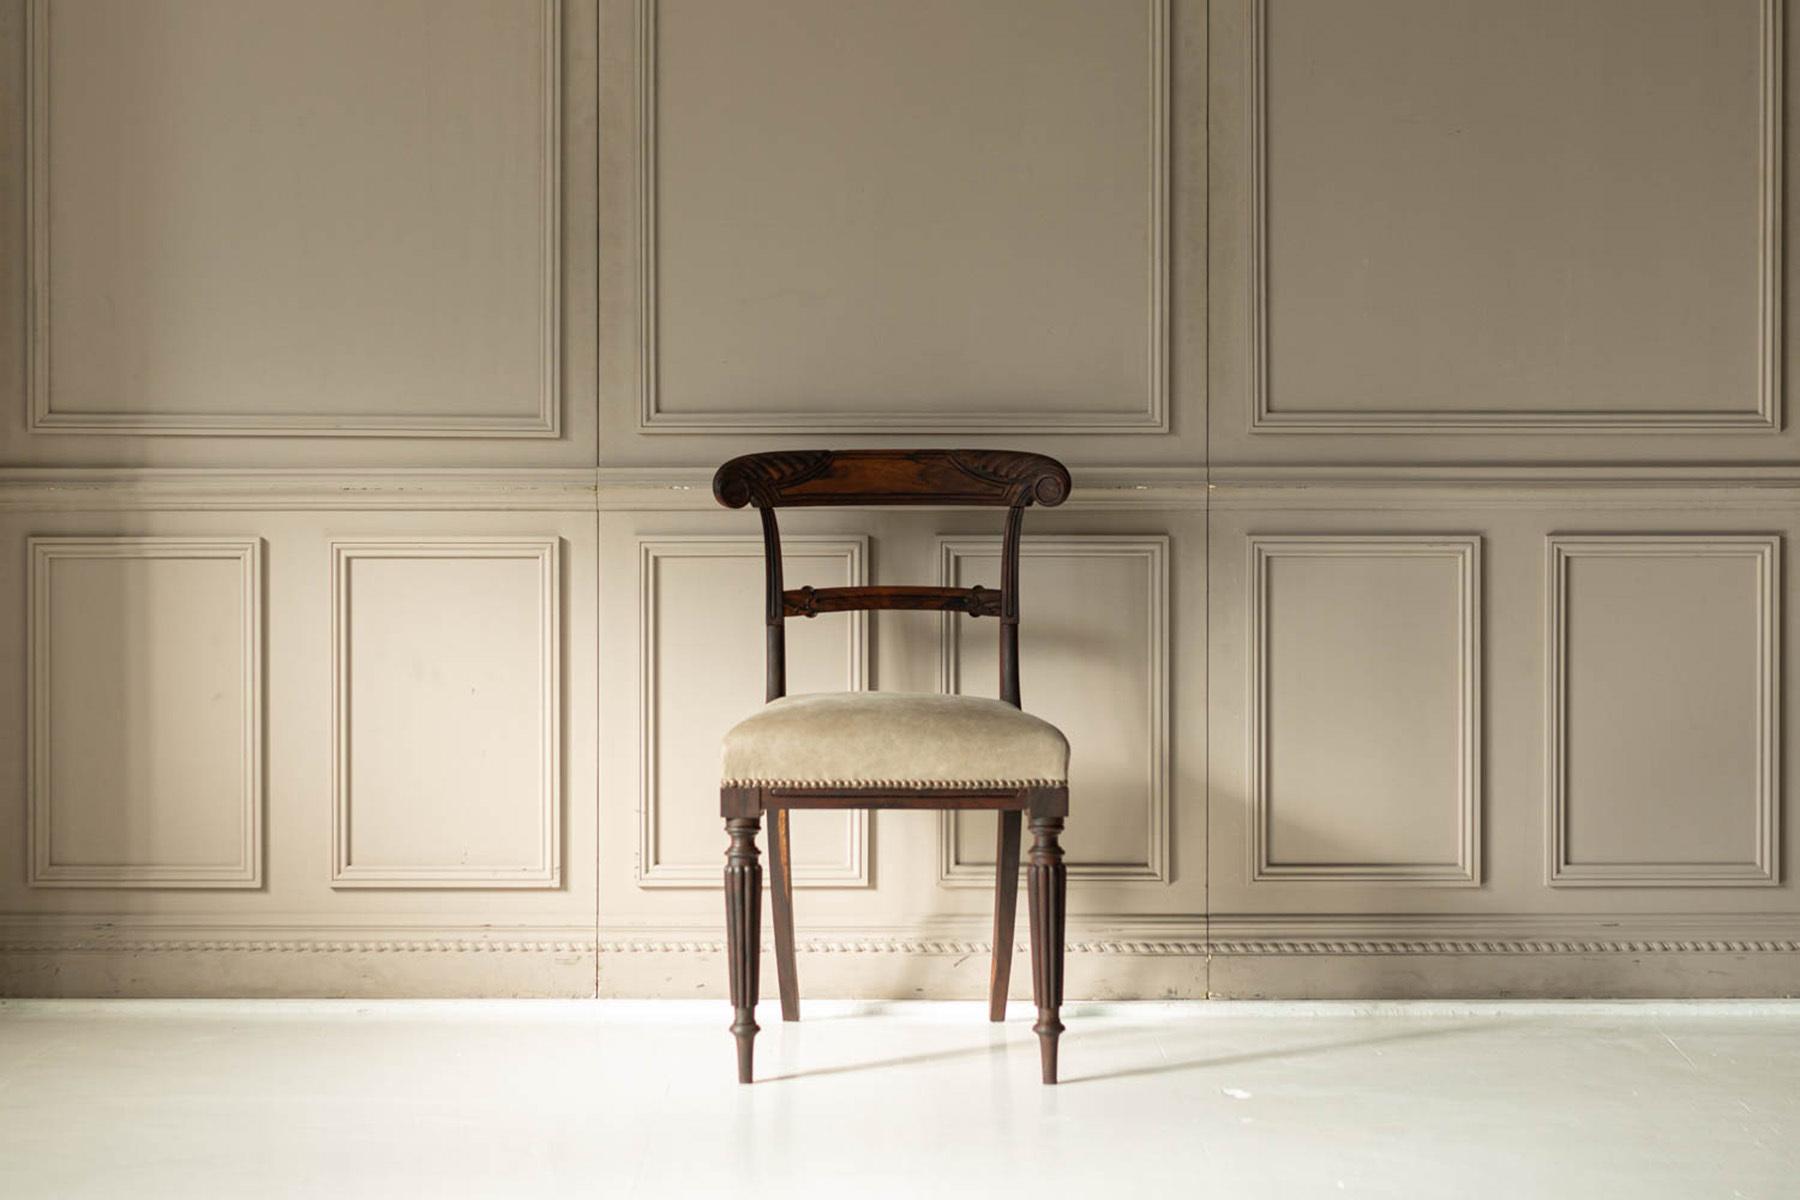 STUDIO FOXTAIL Ast (スタジオ フォックステイル Ast)二面から自然光が差し込む扉と窓